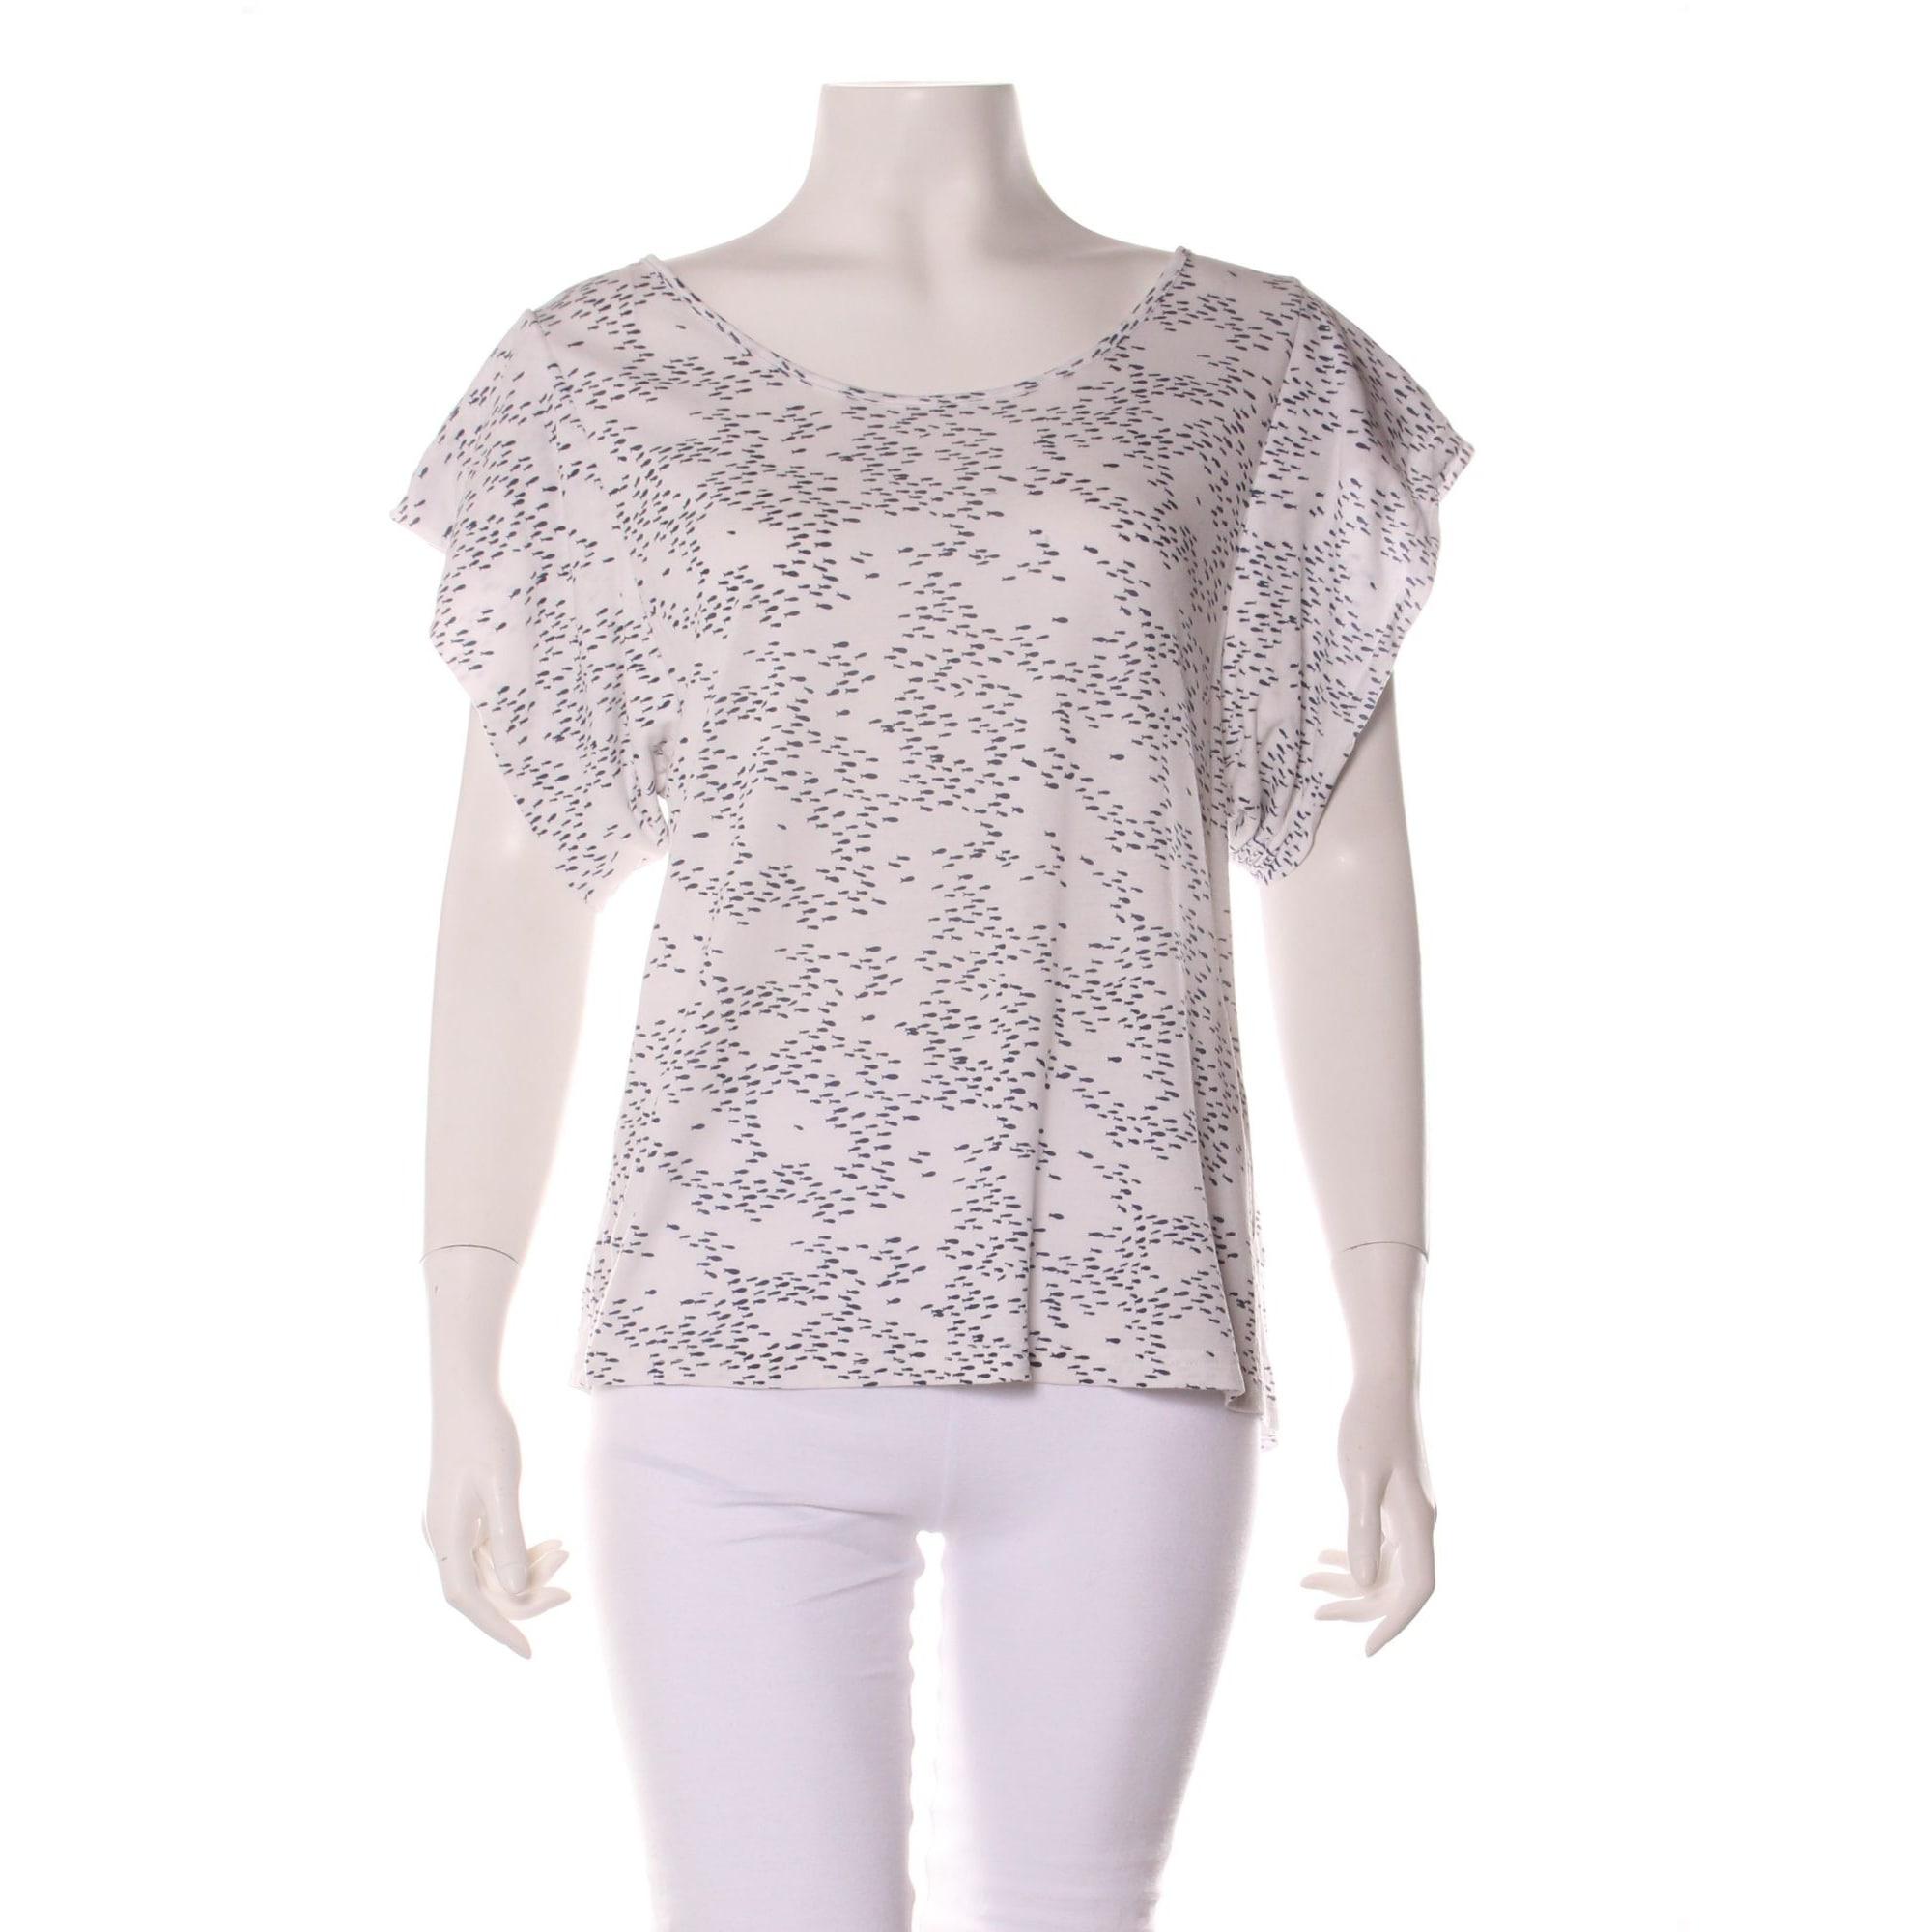 Top, tee-shirt BEL AIR Blanc, blanc cassé, écru